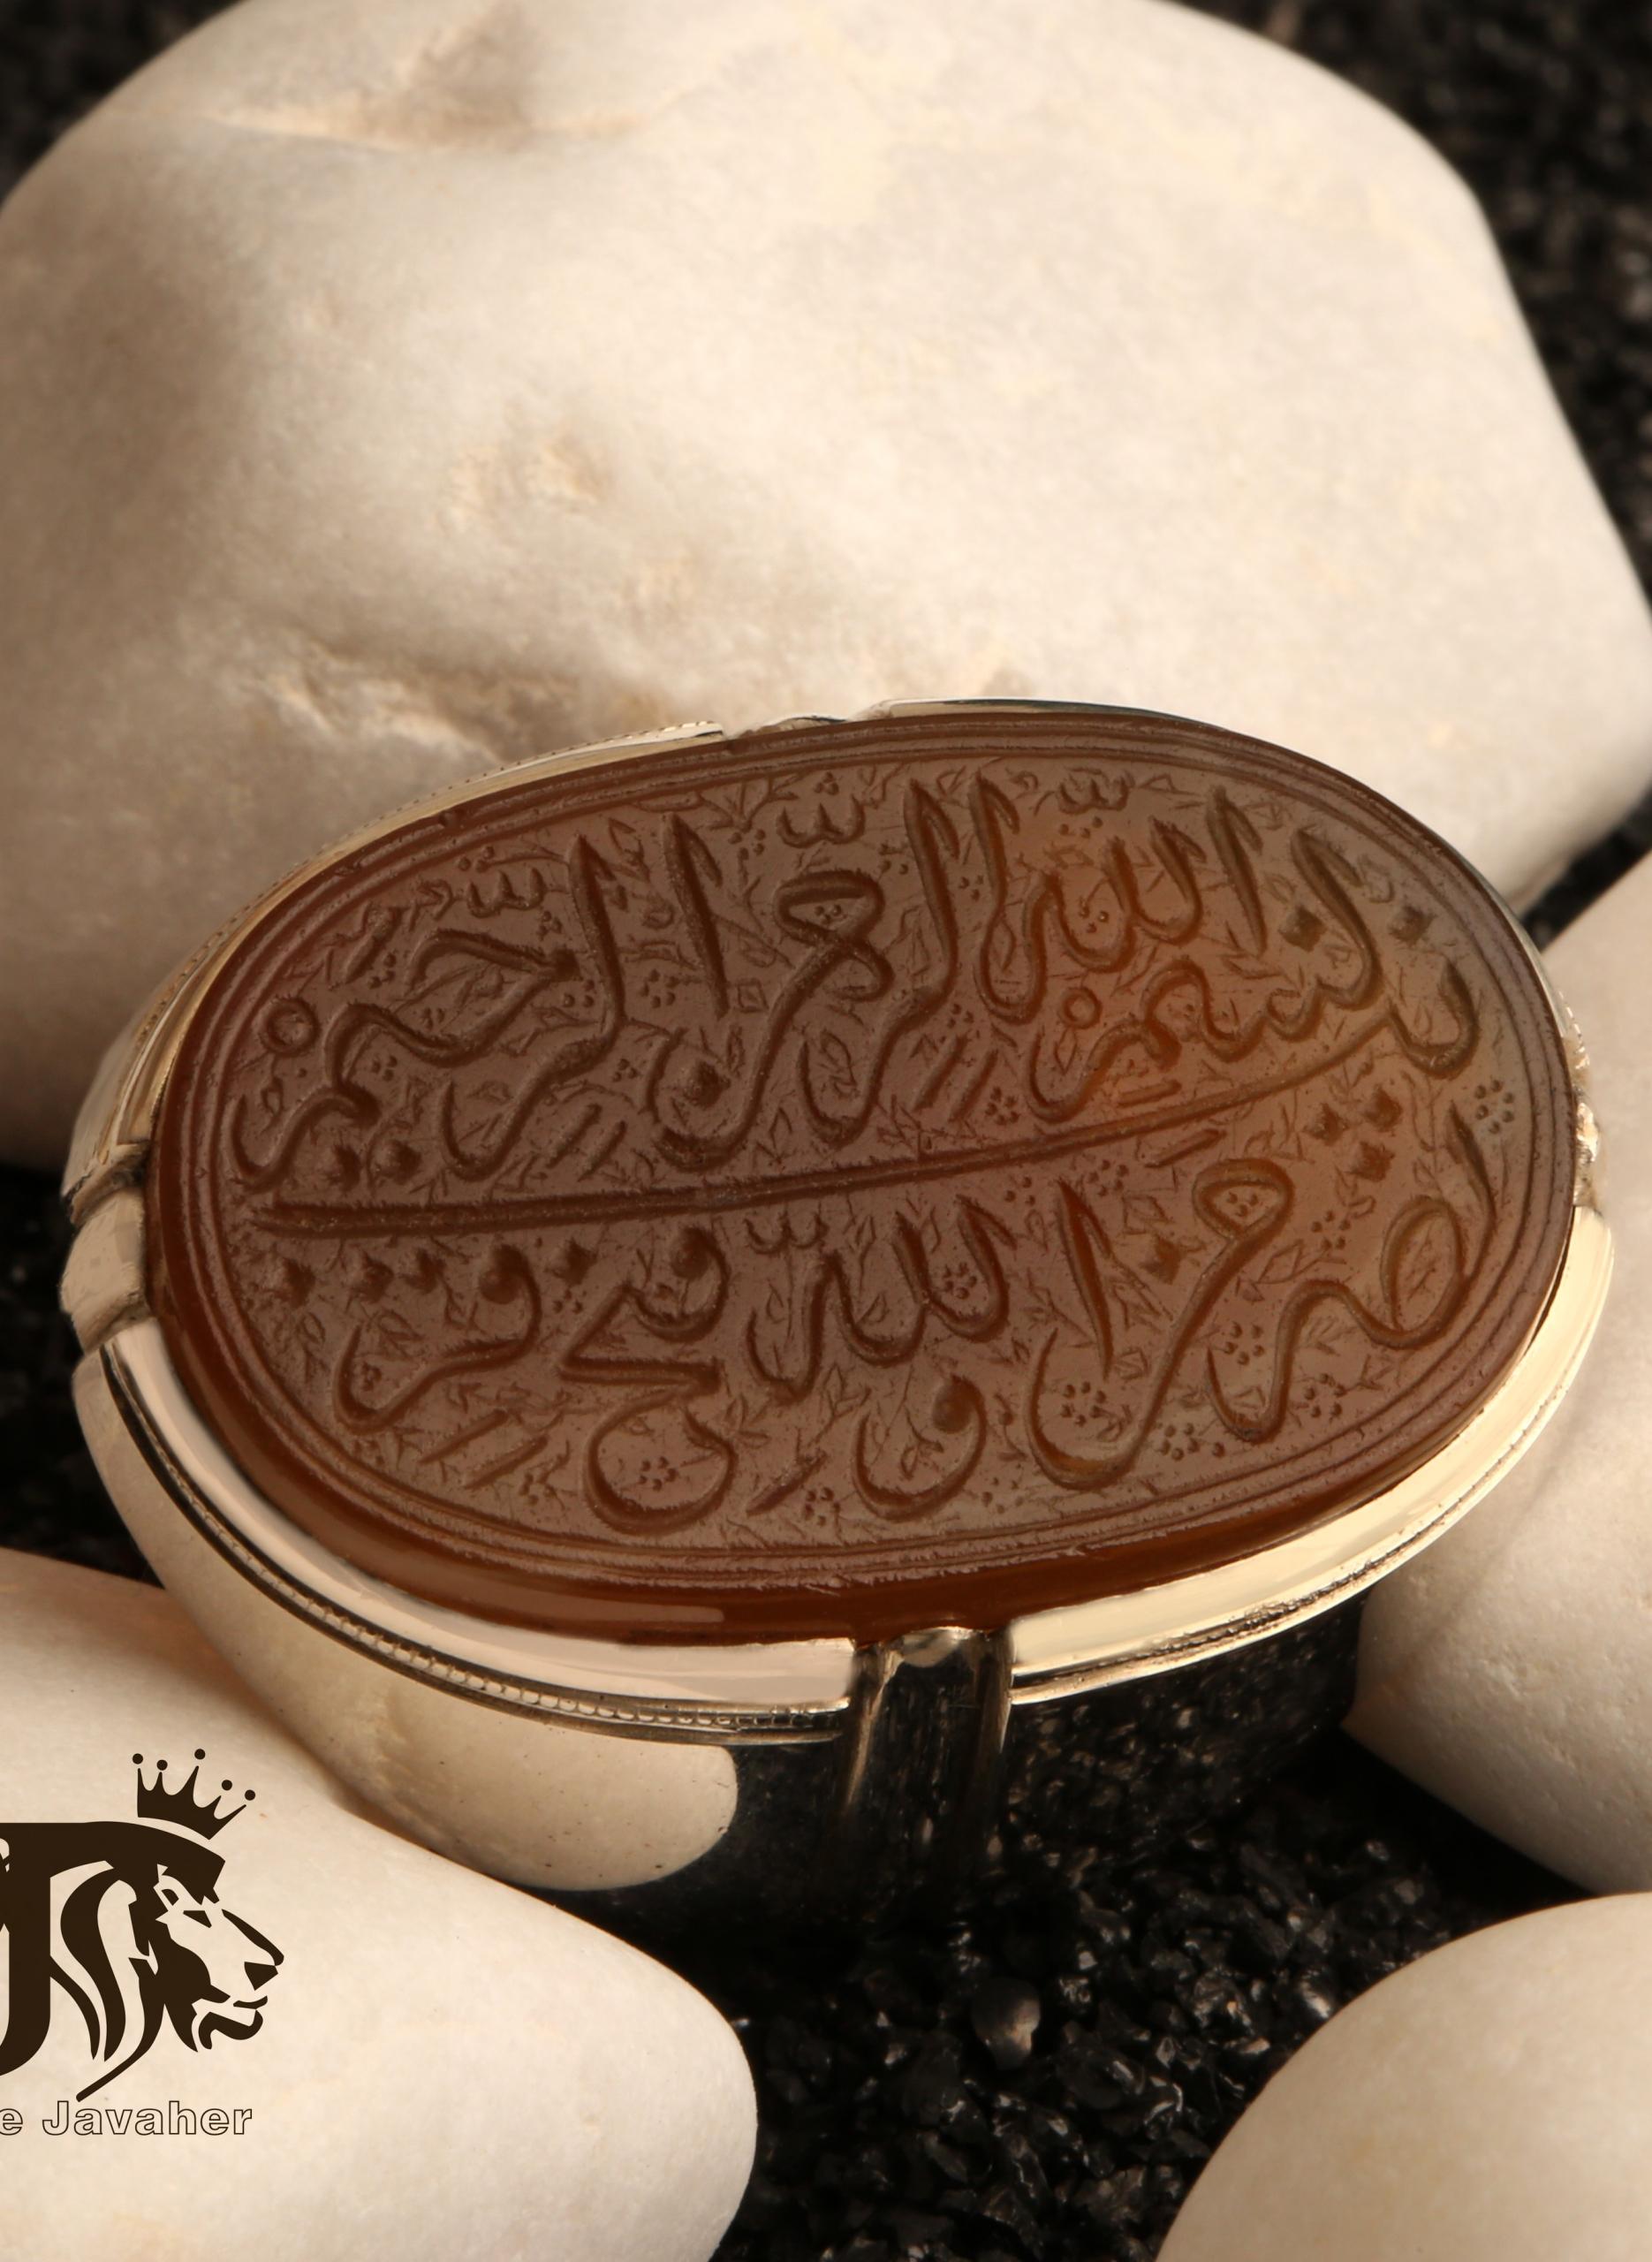 A-1324 انگشتر عقیق یمنی خطی کهنه با پایه فدیوم